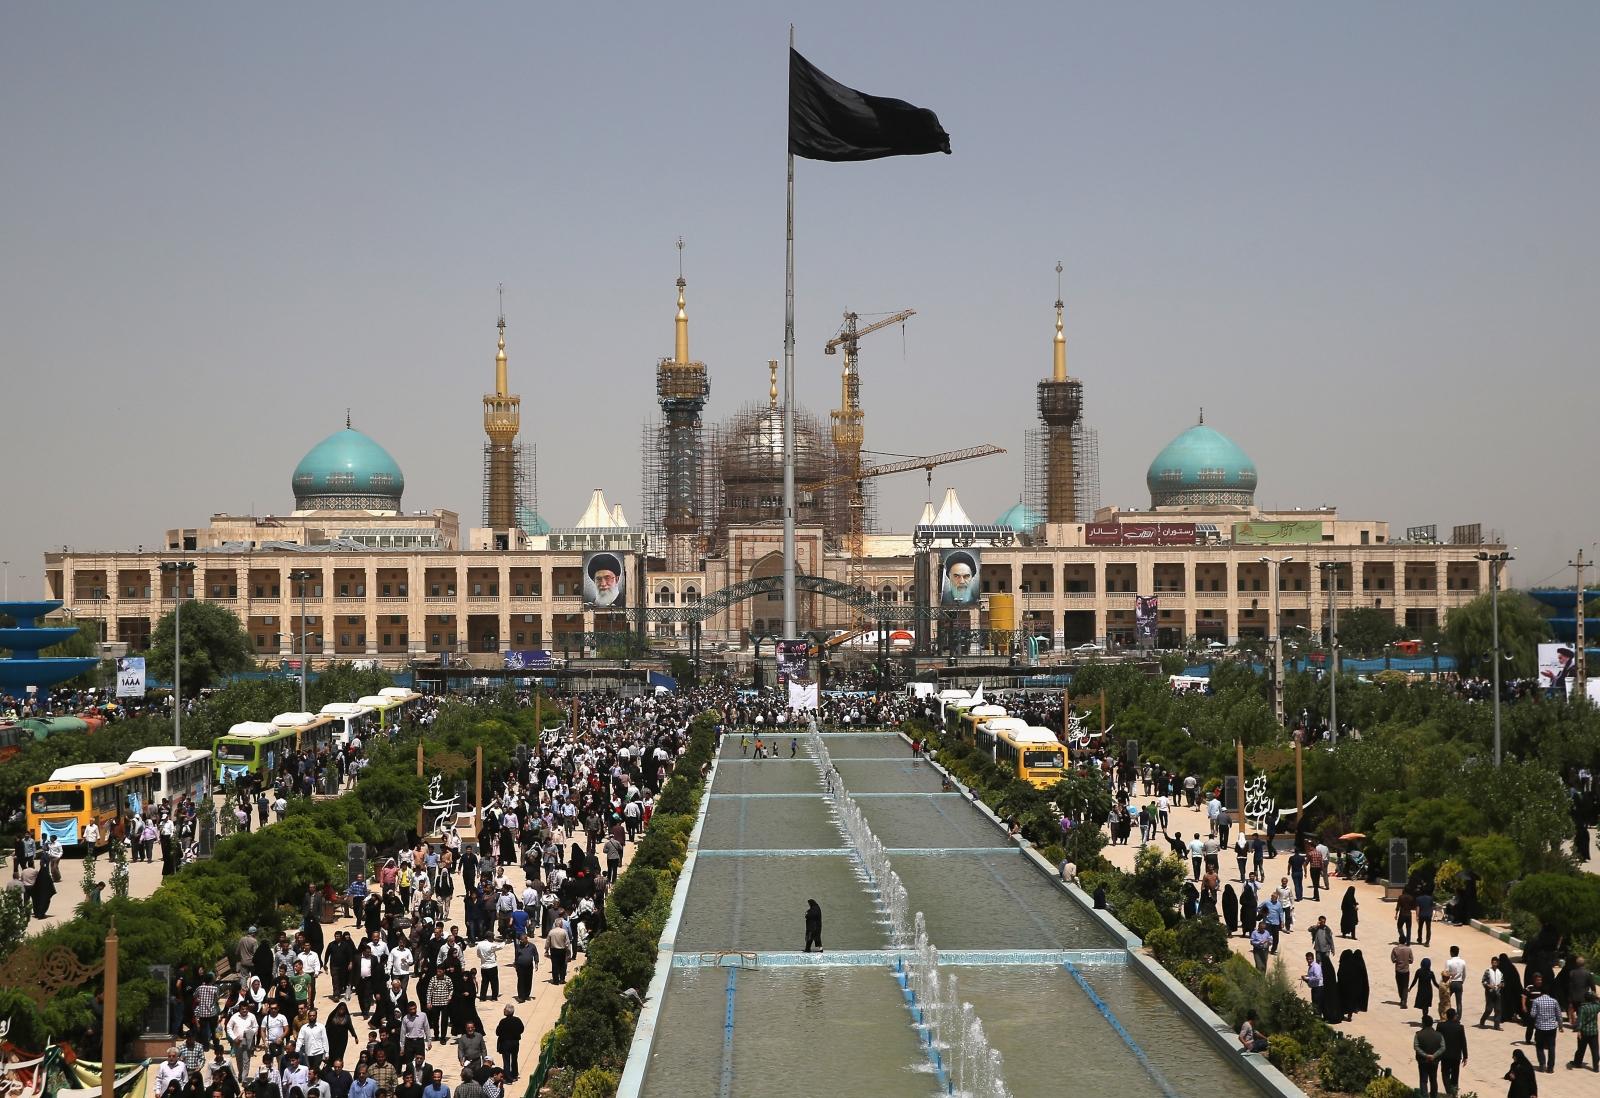 Ayatollah Khomeini shrine